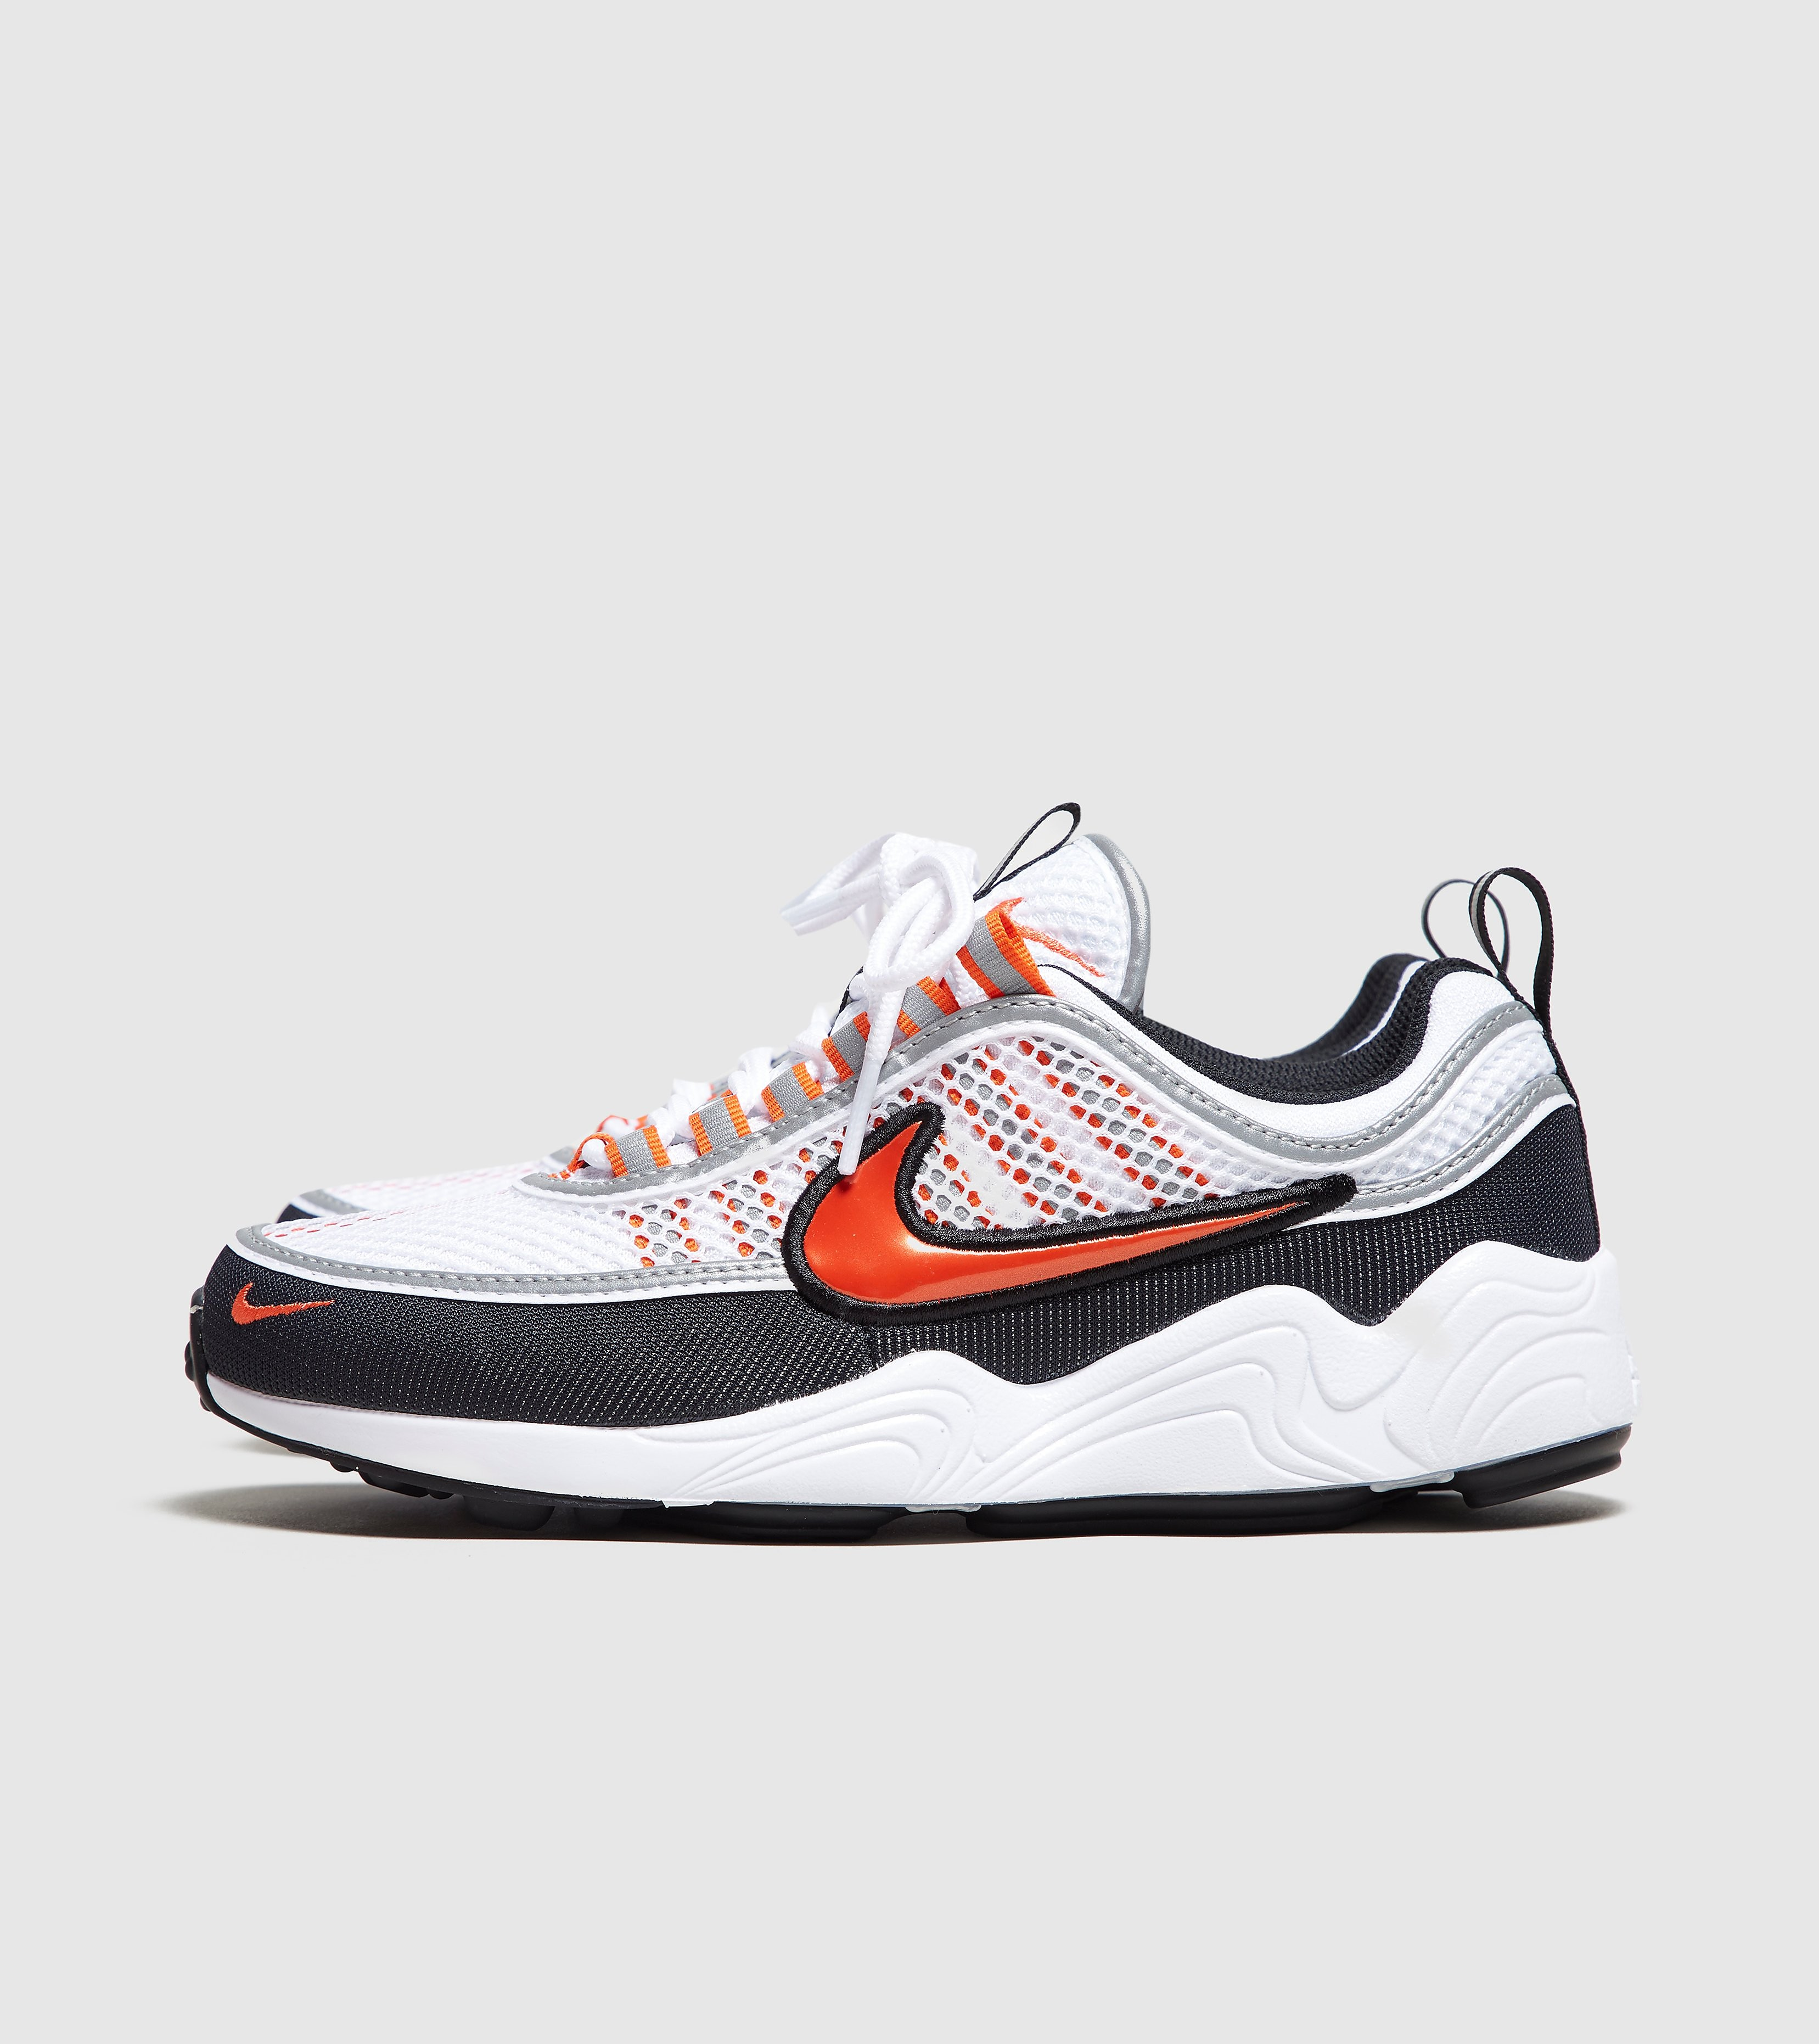 Nike Zoom Spiridon Frauen